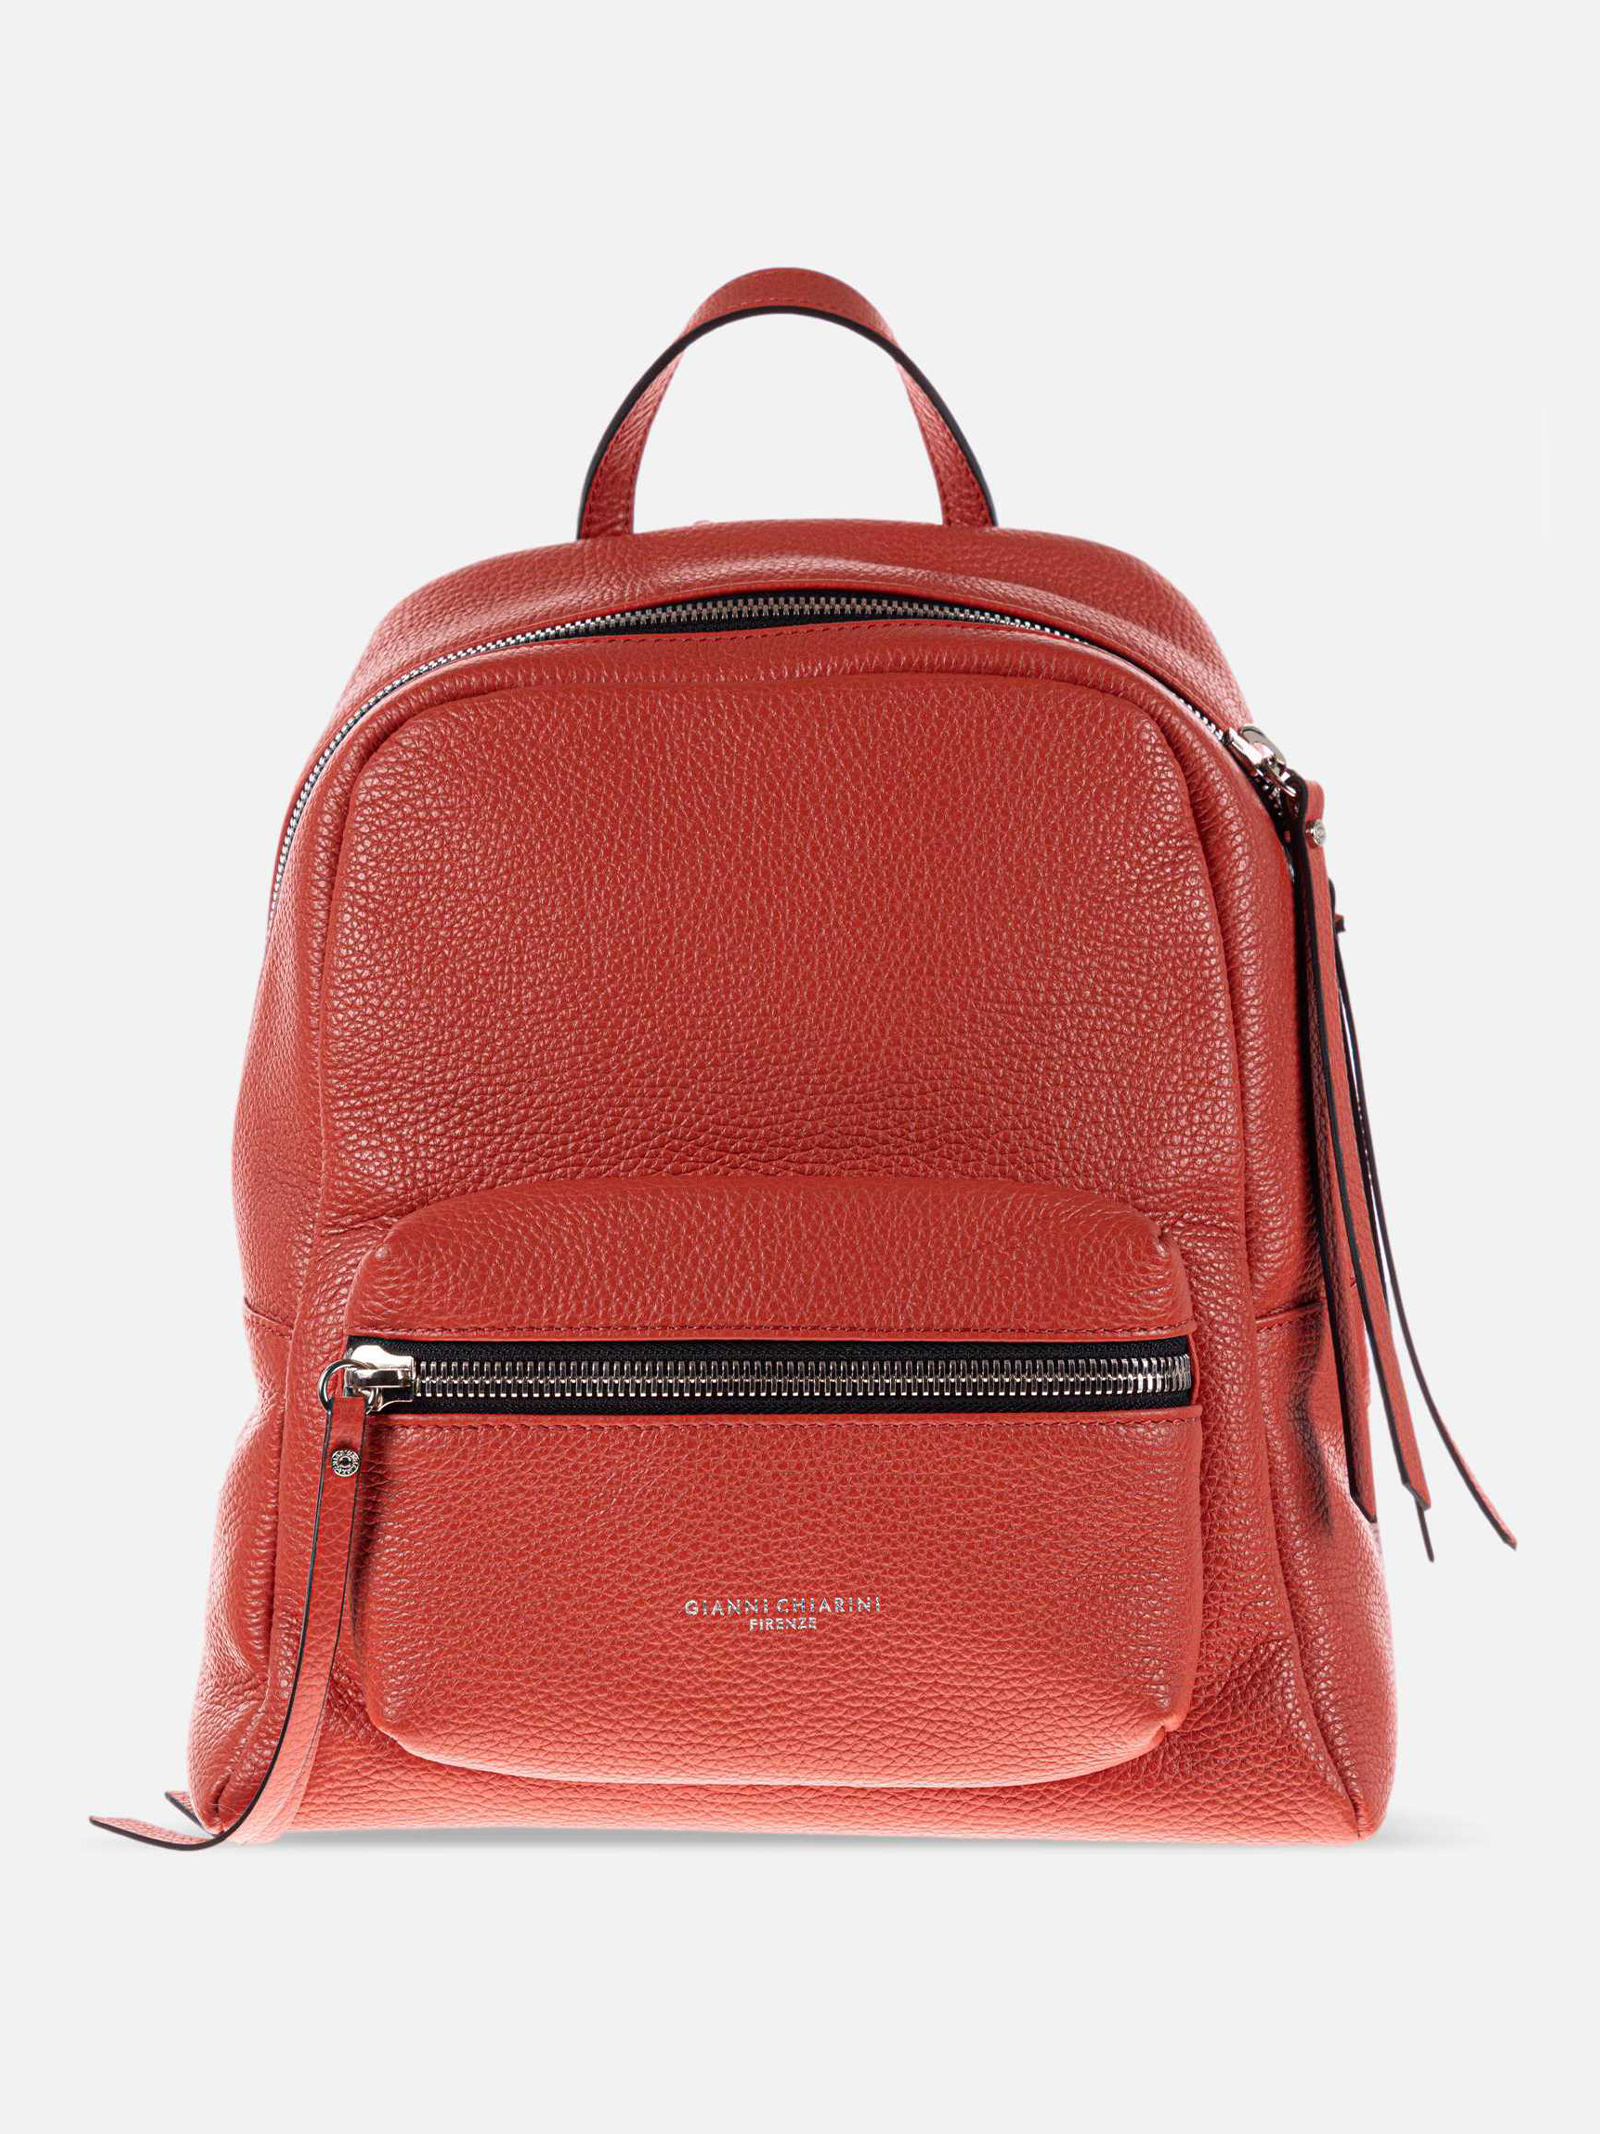 Backpack Gianni Chiarini GIANNI CHIARINI   5032286   ZN860511707